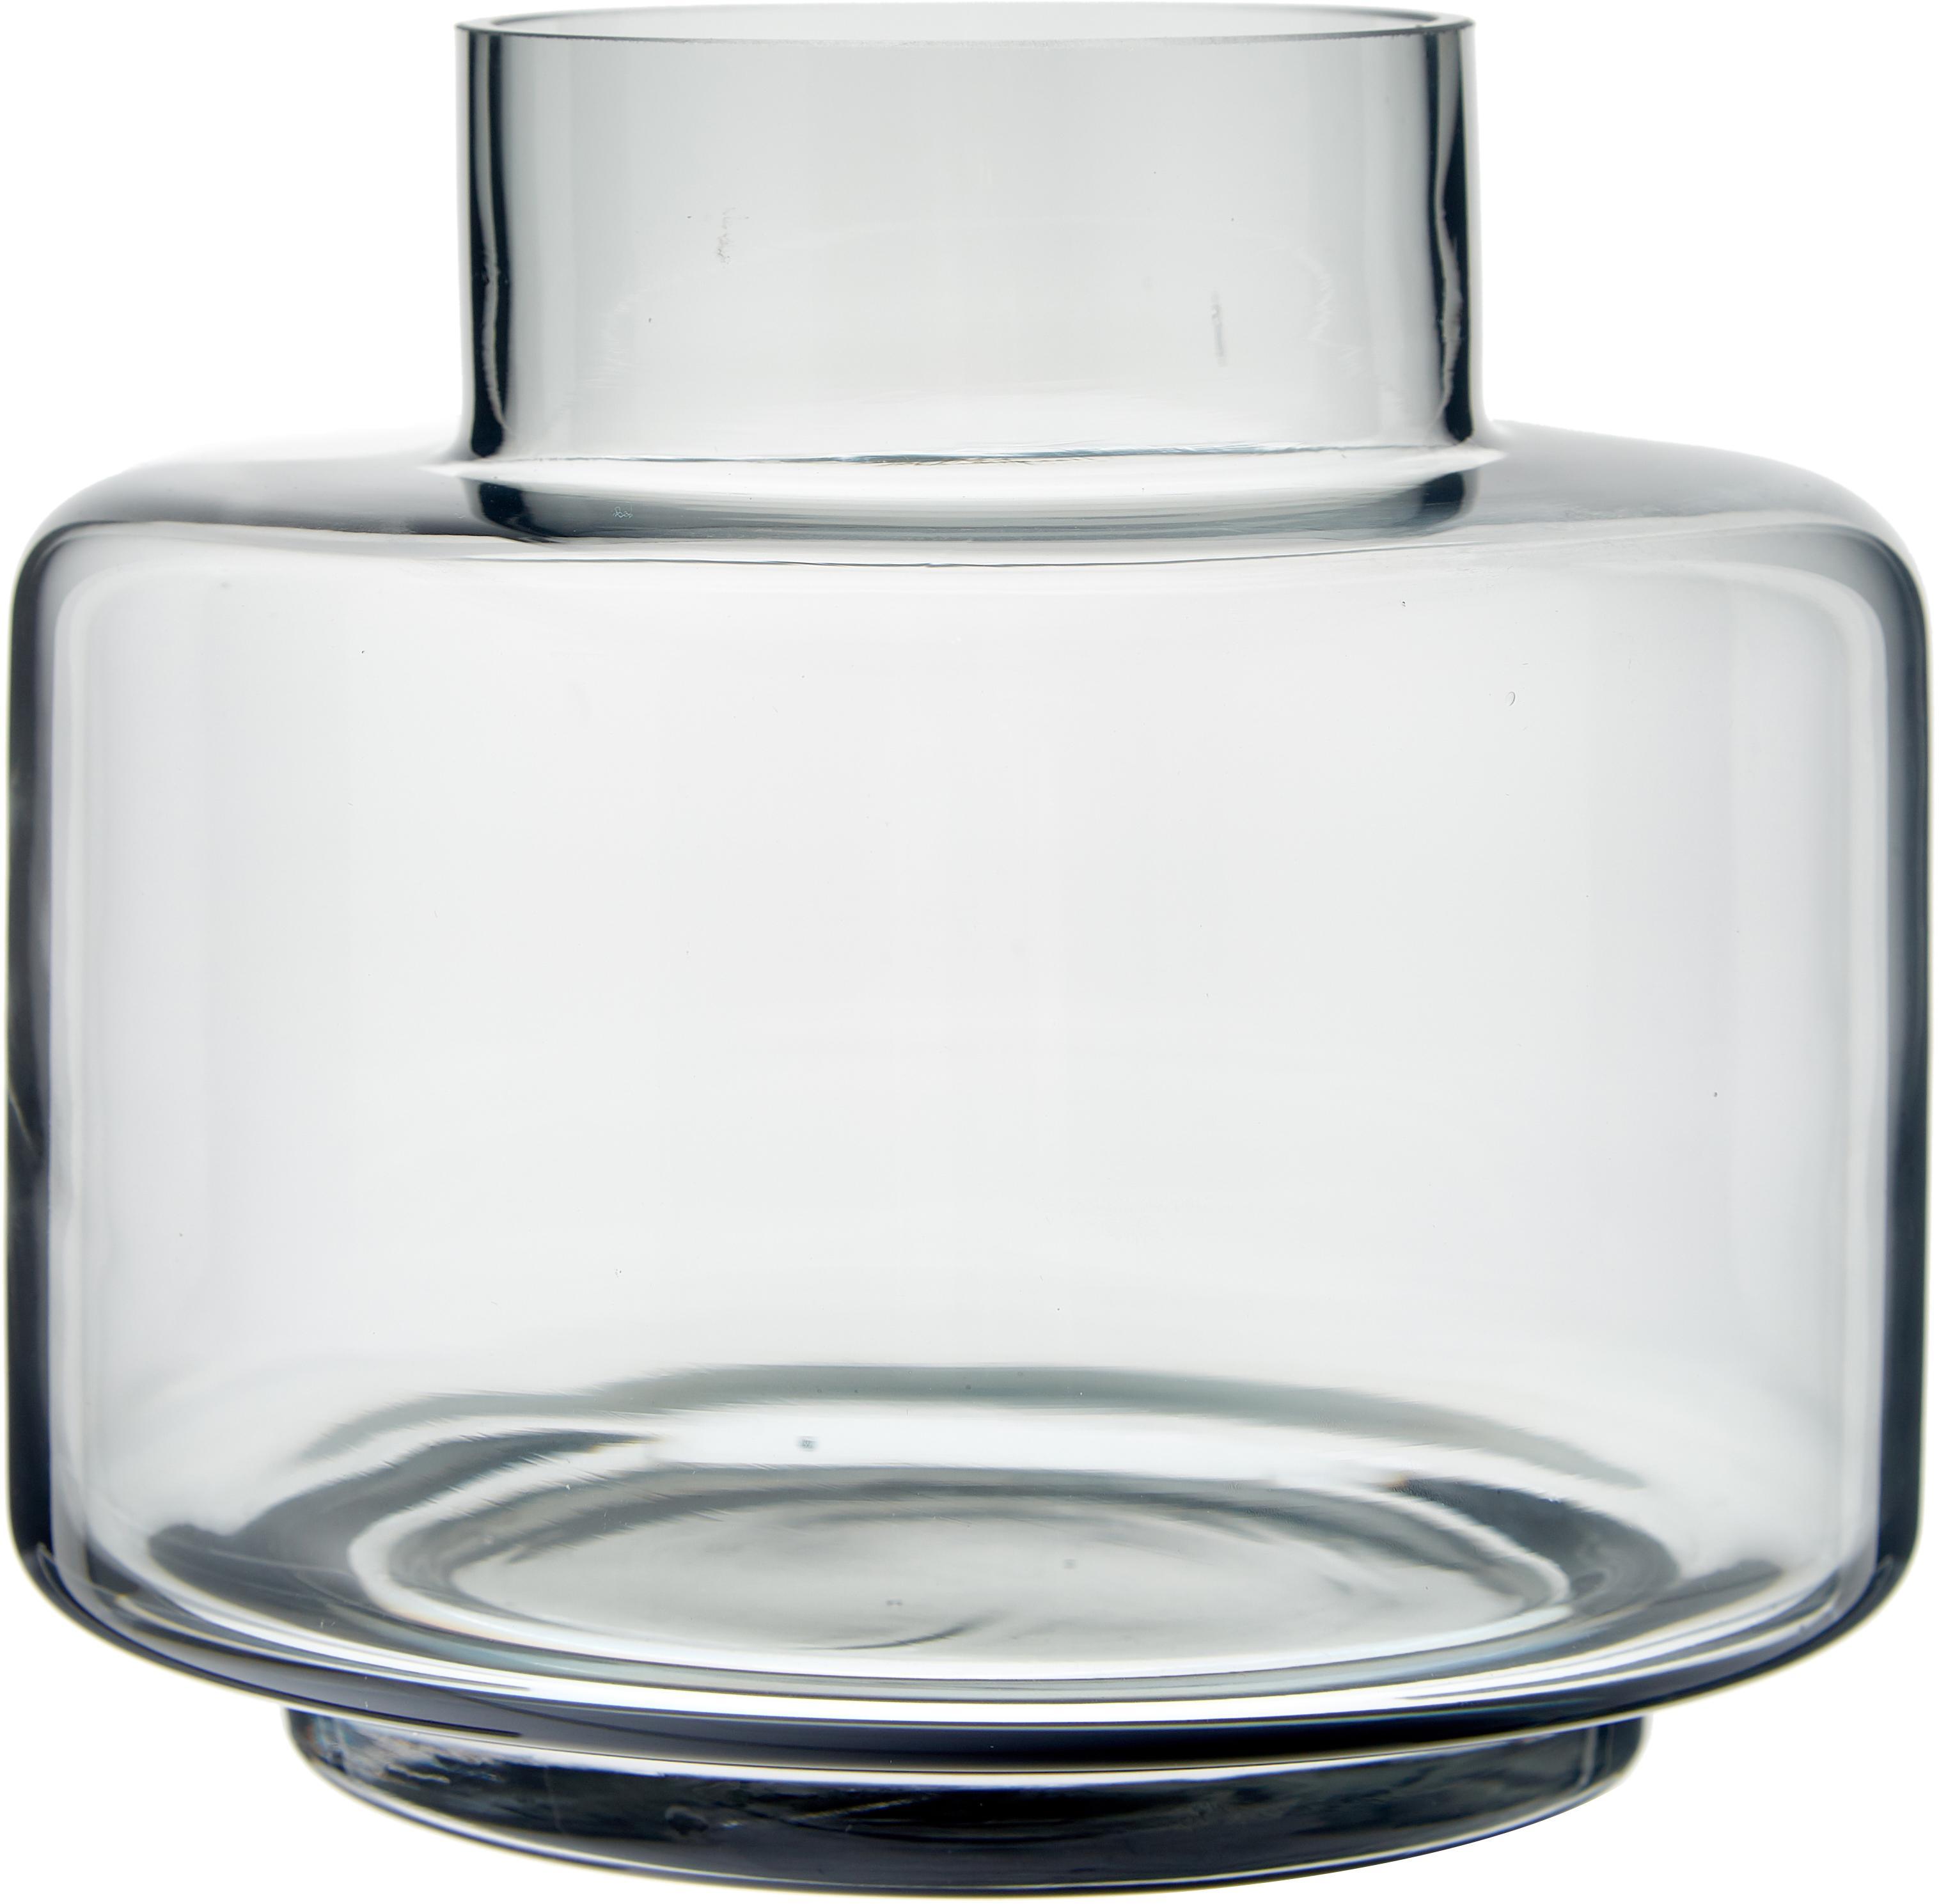 Vaso in vetro soffiato Hedria, Vetro, Grigio cipria, Ø 18 x Alt. 16 cm